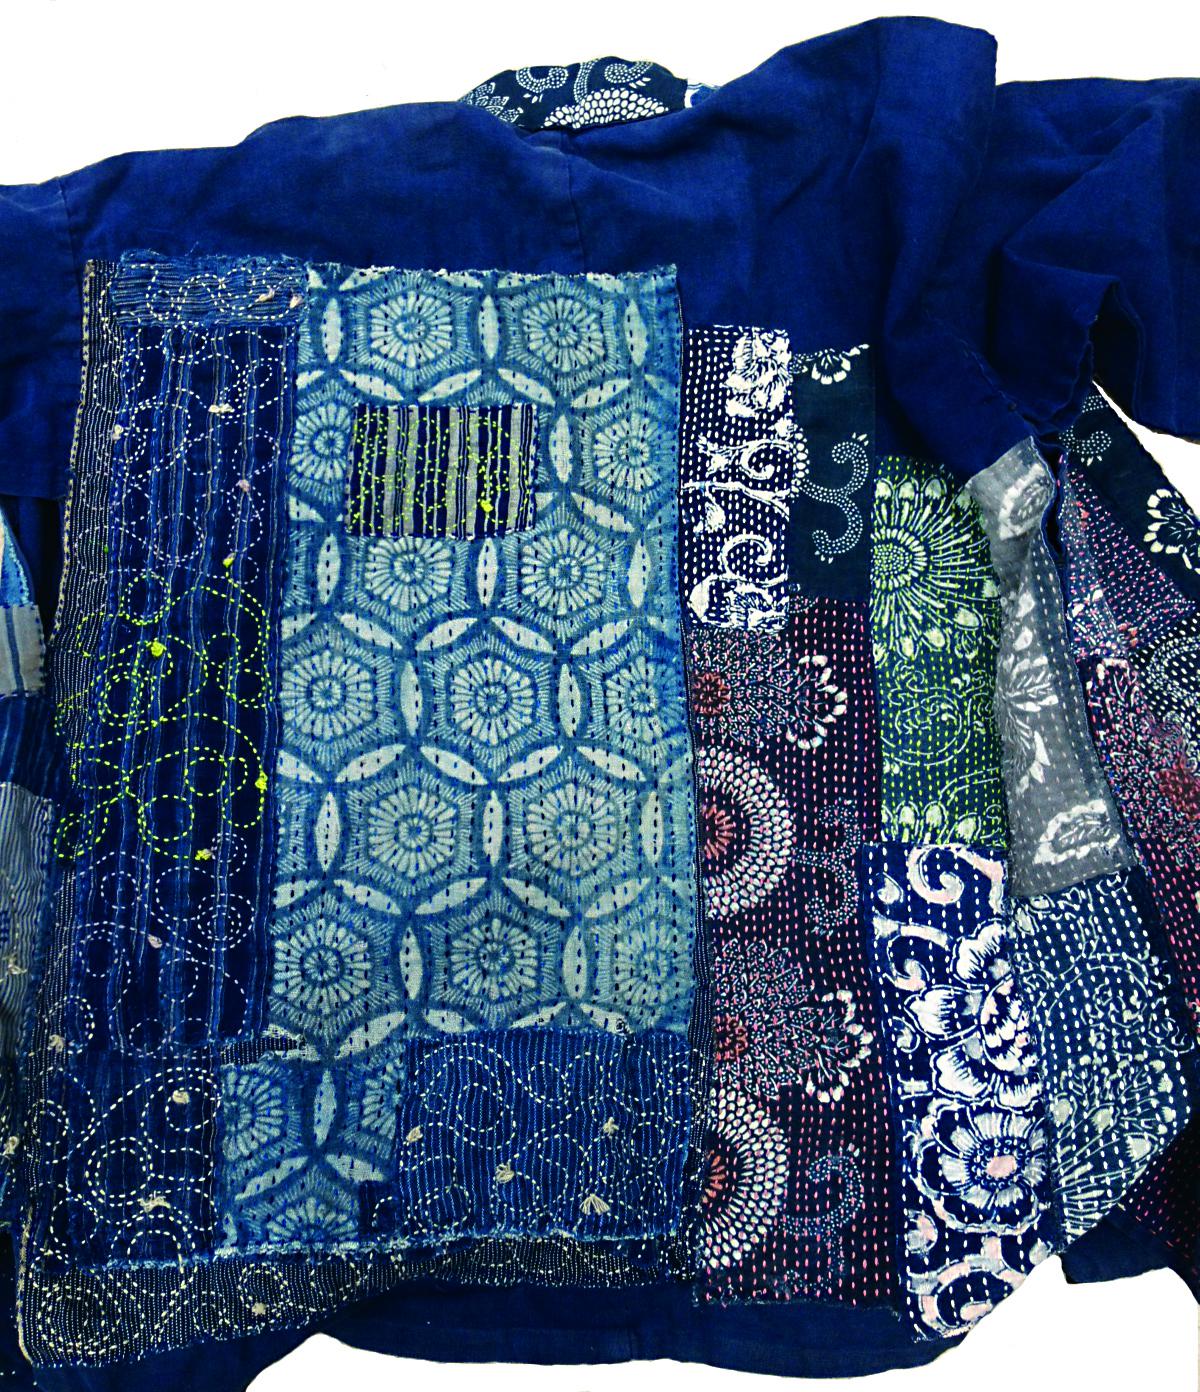 Photo of Temari fabric, promoting Temari Workshops being held at Hawaii Japanese Center in Hilo